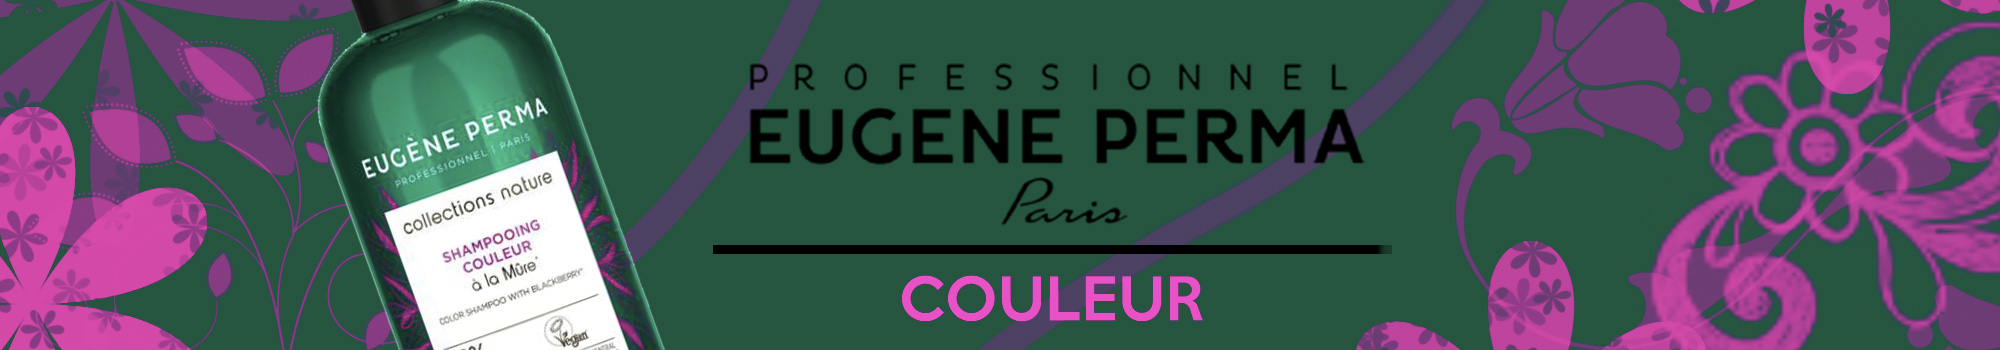 Collections Nature Couleur Eugène Perma